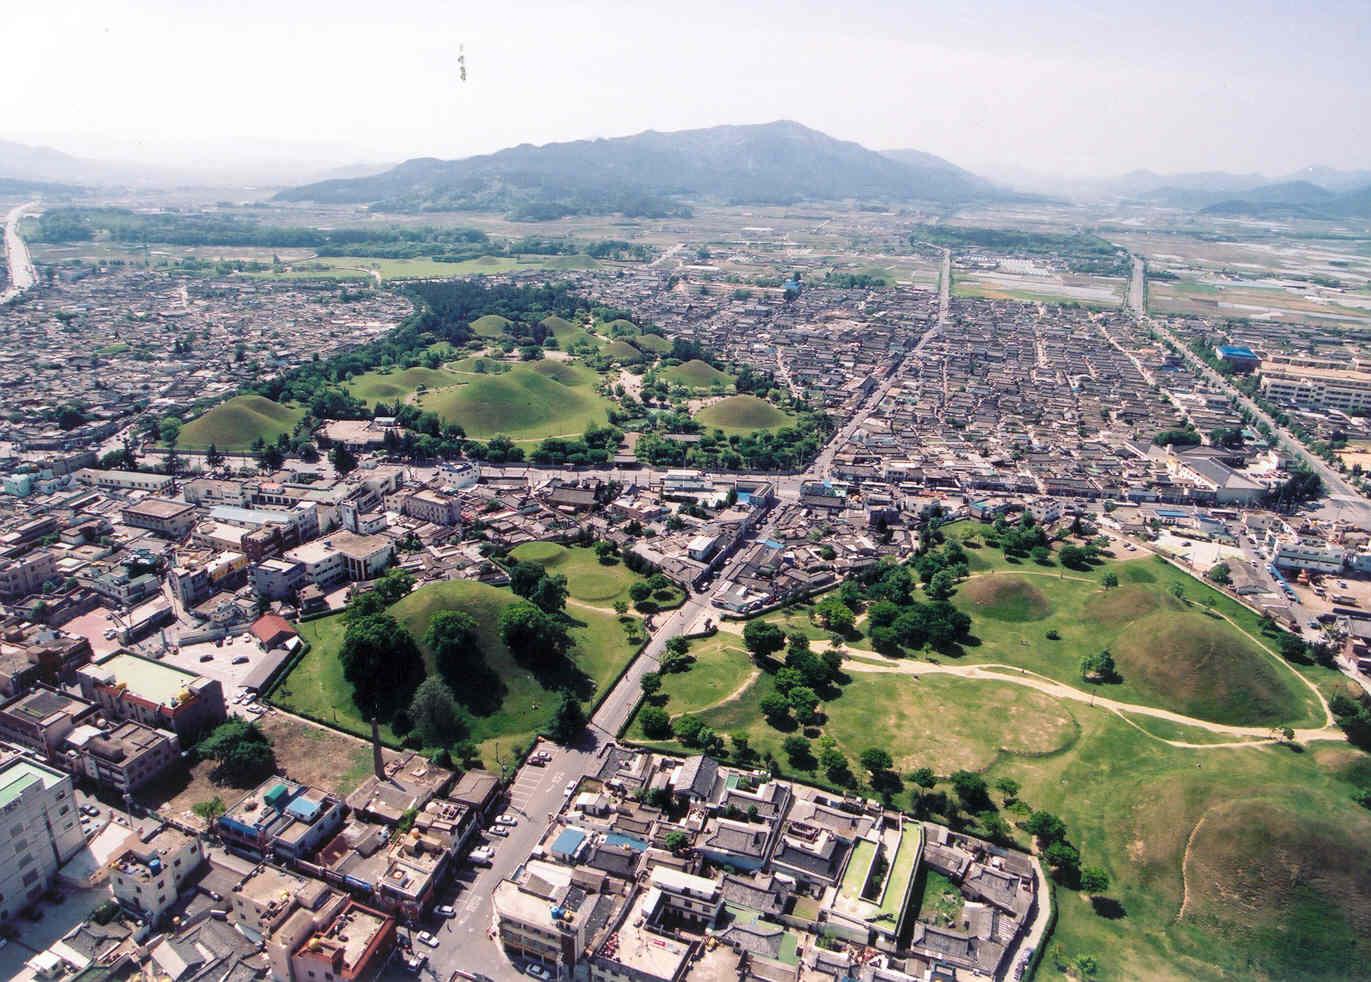 http://3.bp.blogspot.com/-0SQiy2Tm_e0/UCbFcUoBmrI/AAAAAAAAB1M/P7BOEujwhFg/s1600/Kota-Gyeongju.jpg